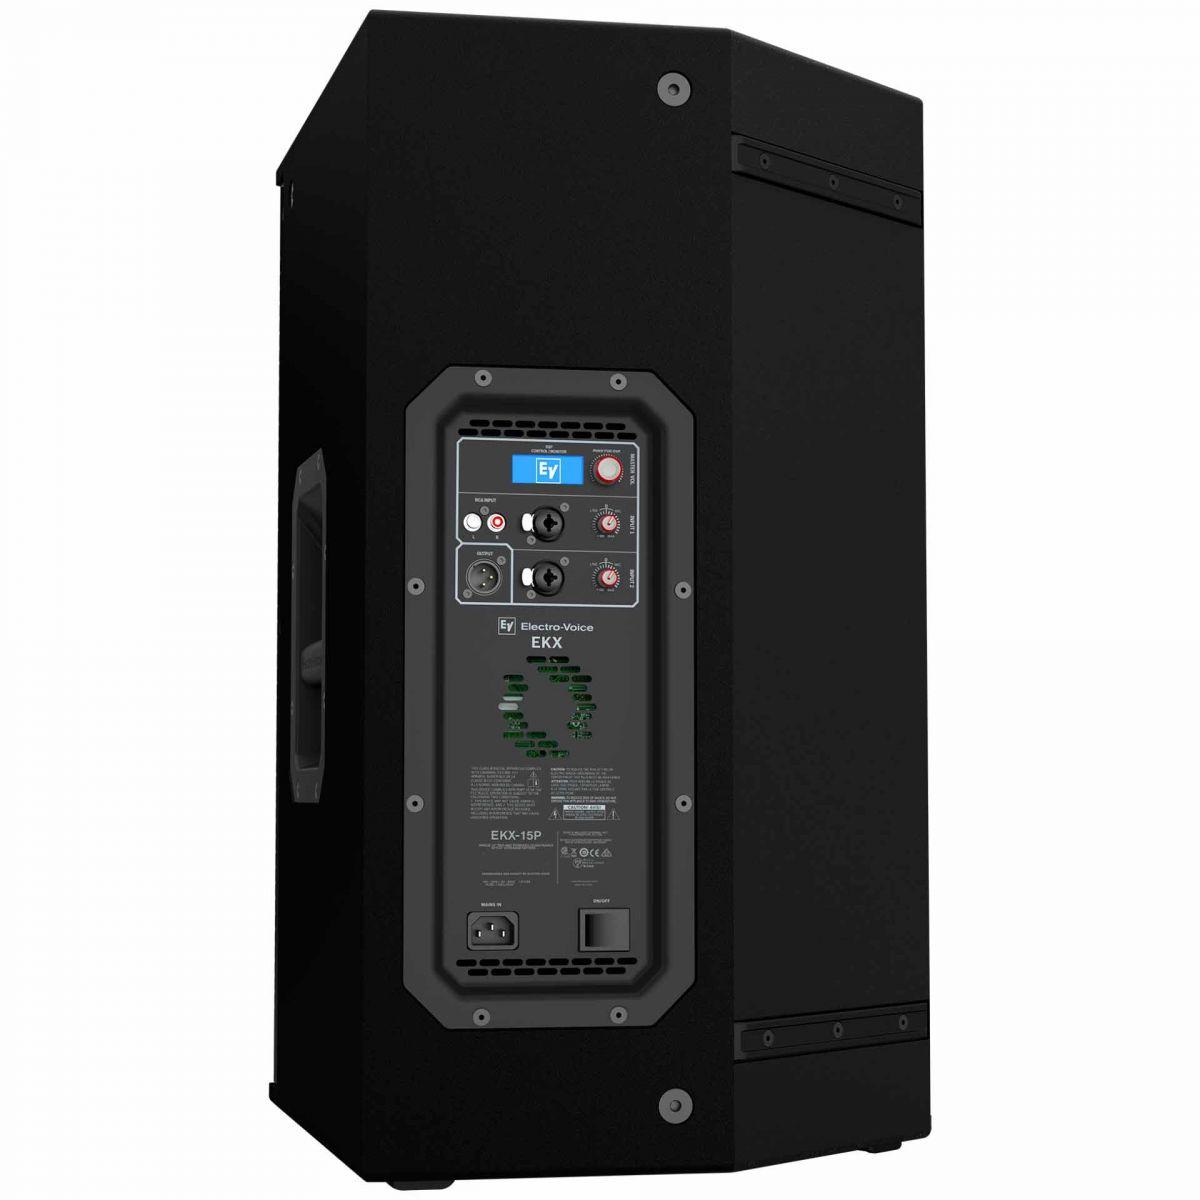 Caixa Ativa Fal 15 Pol 1500W - EKX 15P US Electro-Voice